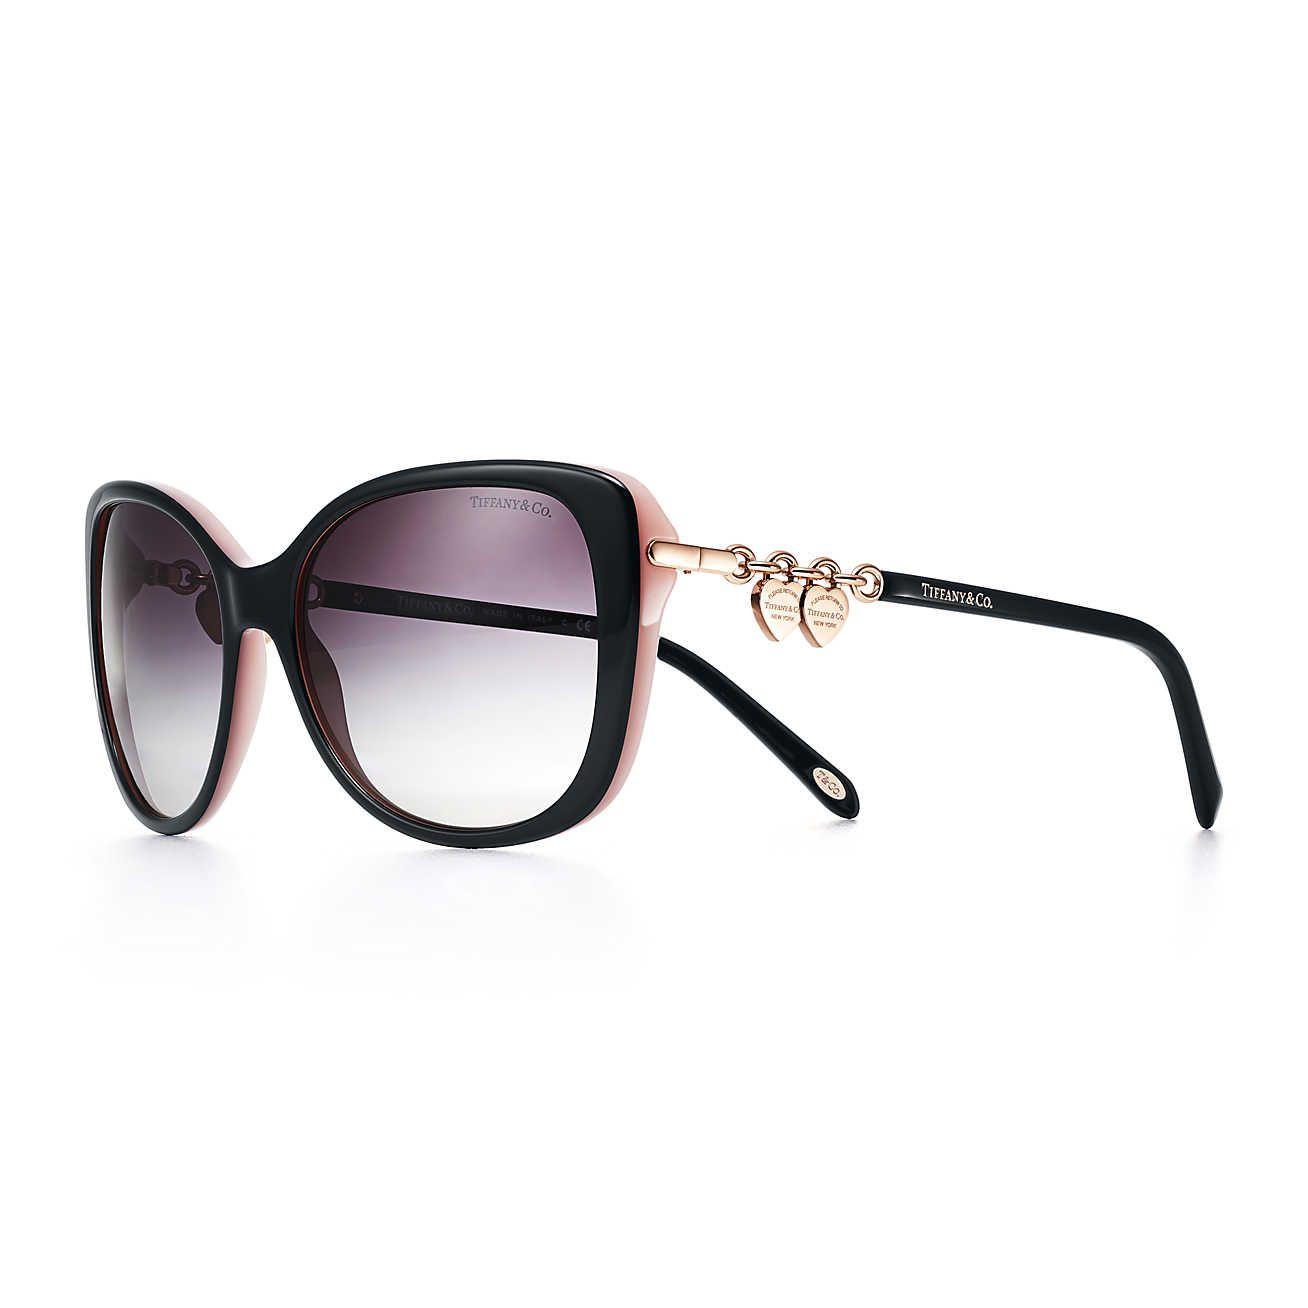 481c6888fb1 Return to Tiffany® rectangular sunglasses in black and pink acetate.